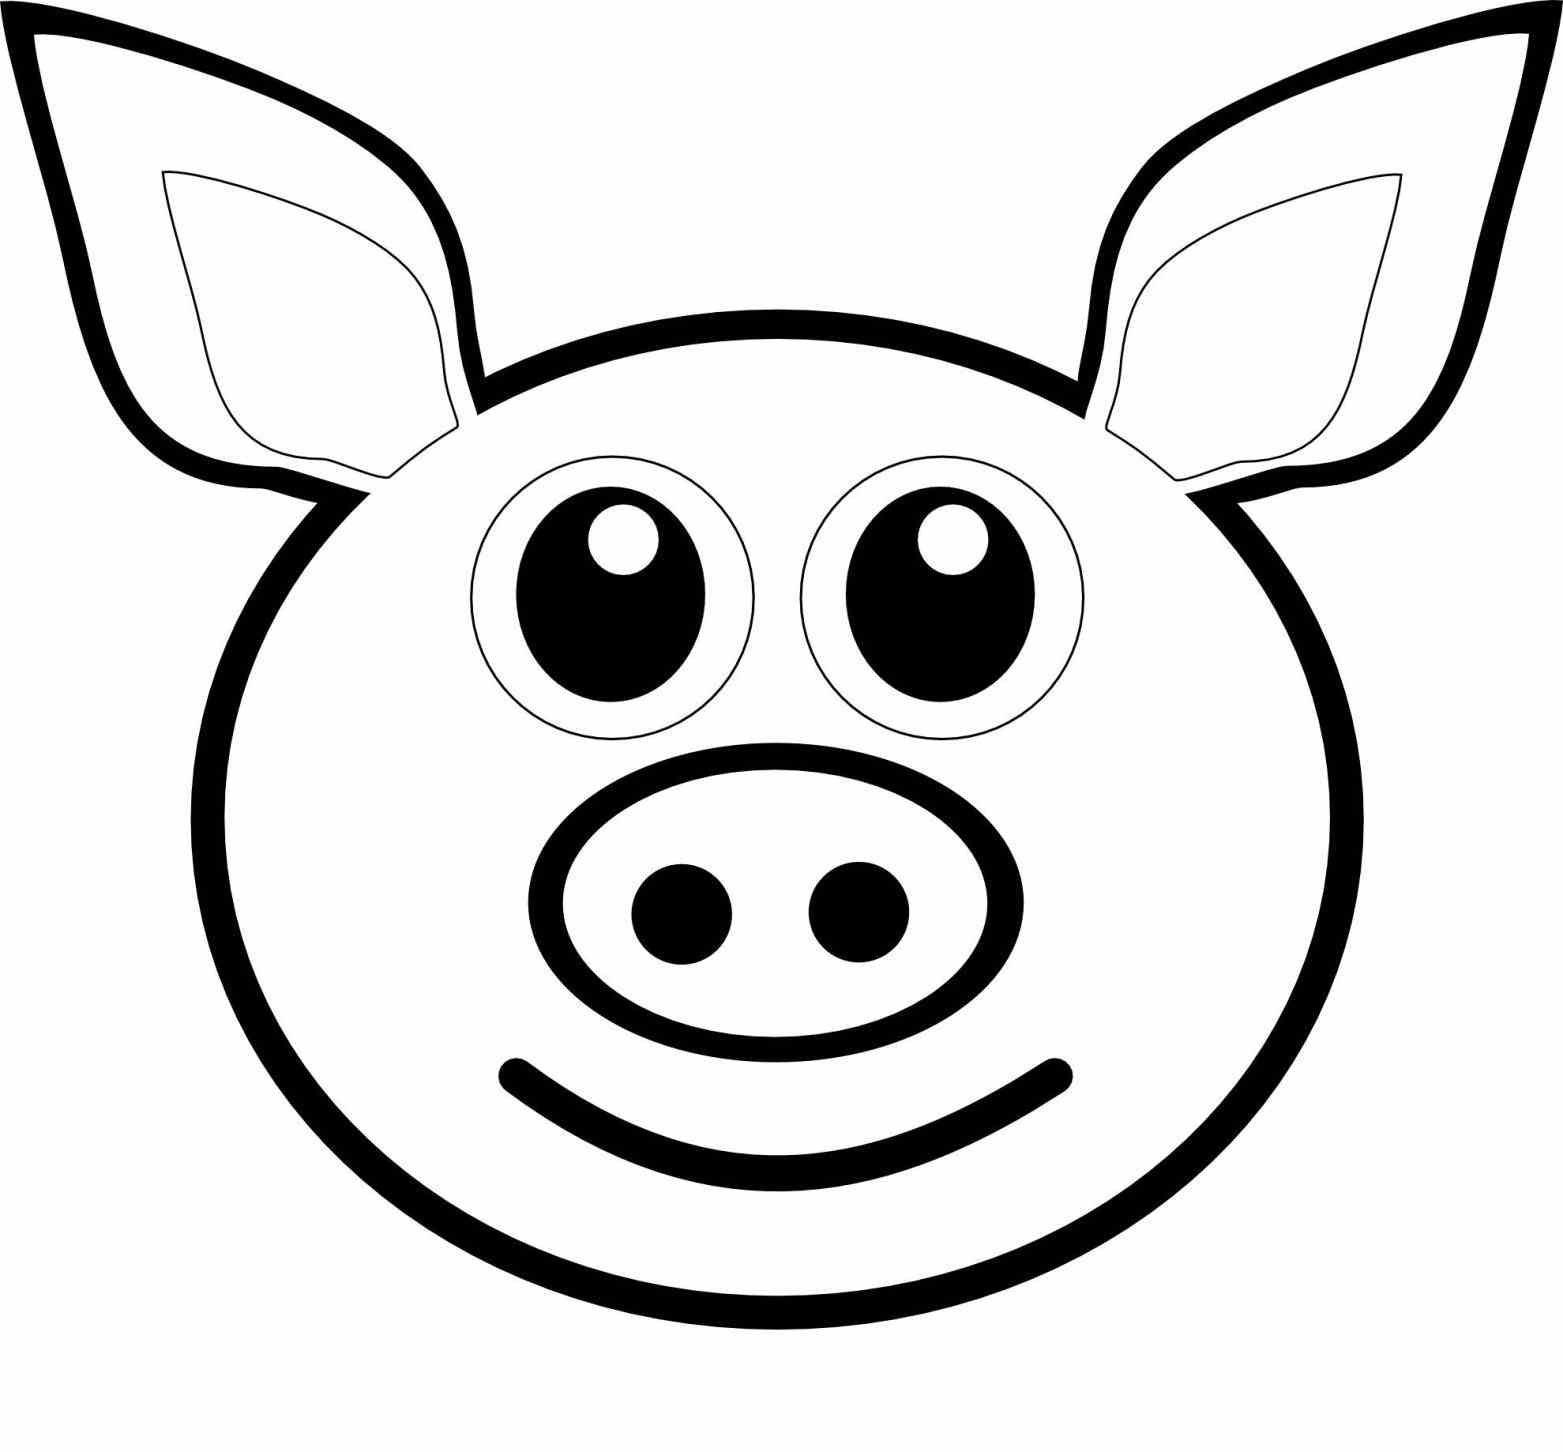 Морда свиньи рисунок